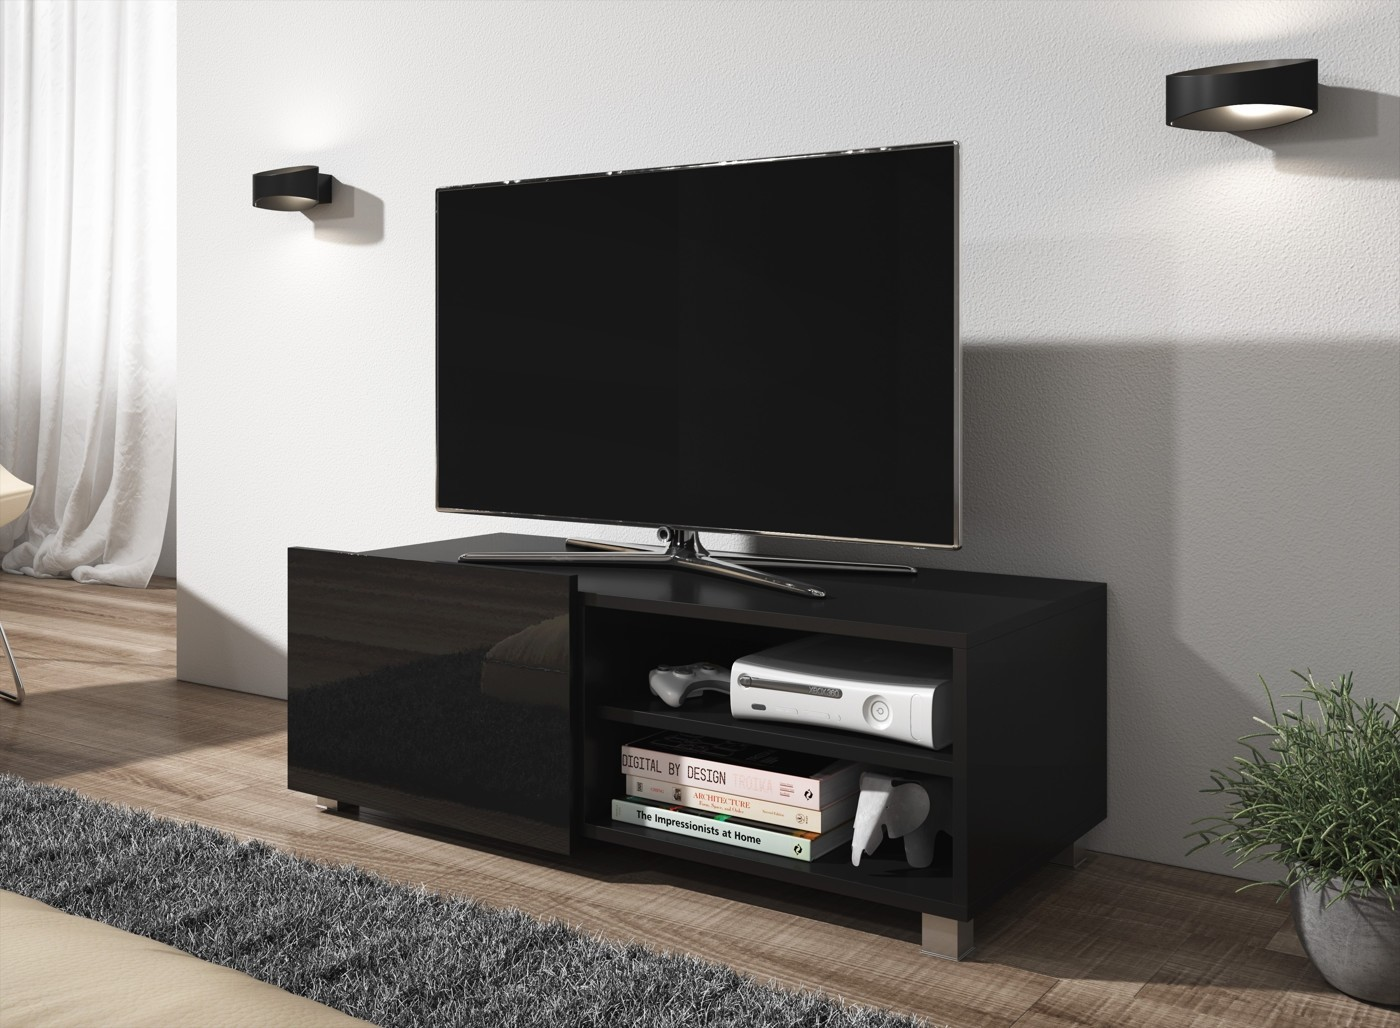 Tv Meubel 100 Cm.Tv Meubel Galia Zwart 100 Cm Meubella